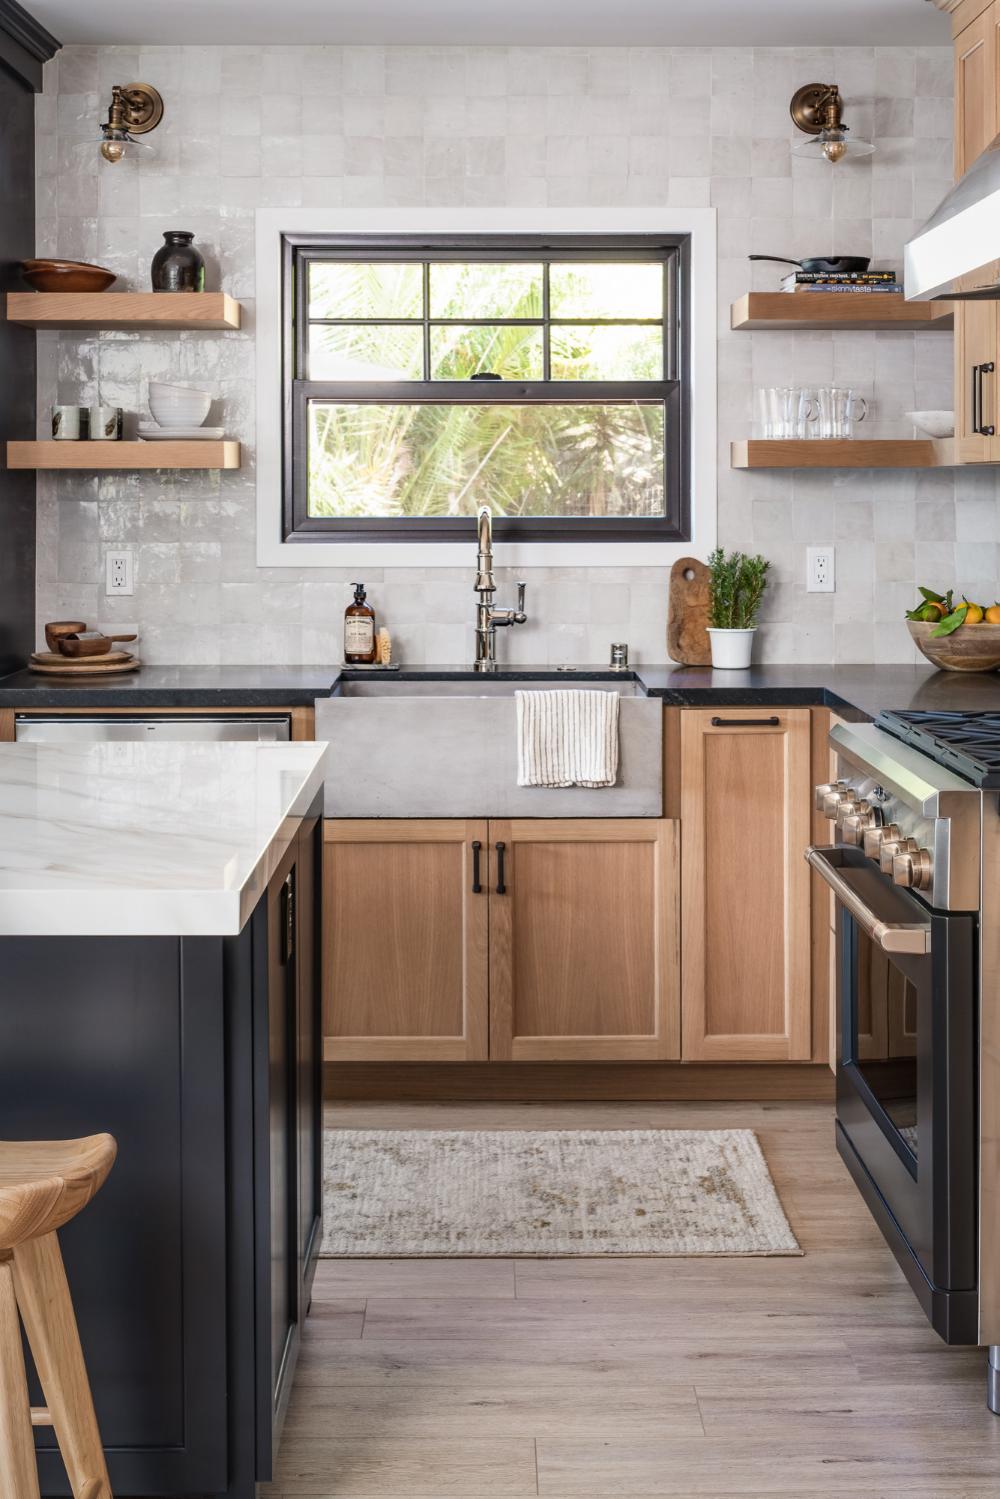 Adobe Falls Kitchen Remodel Transitional San Diego By M Prevost Design In 2020 Kitchen Beach House Interior House Interior